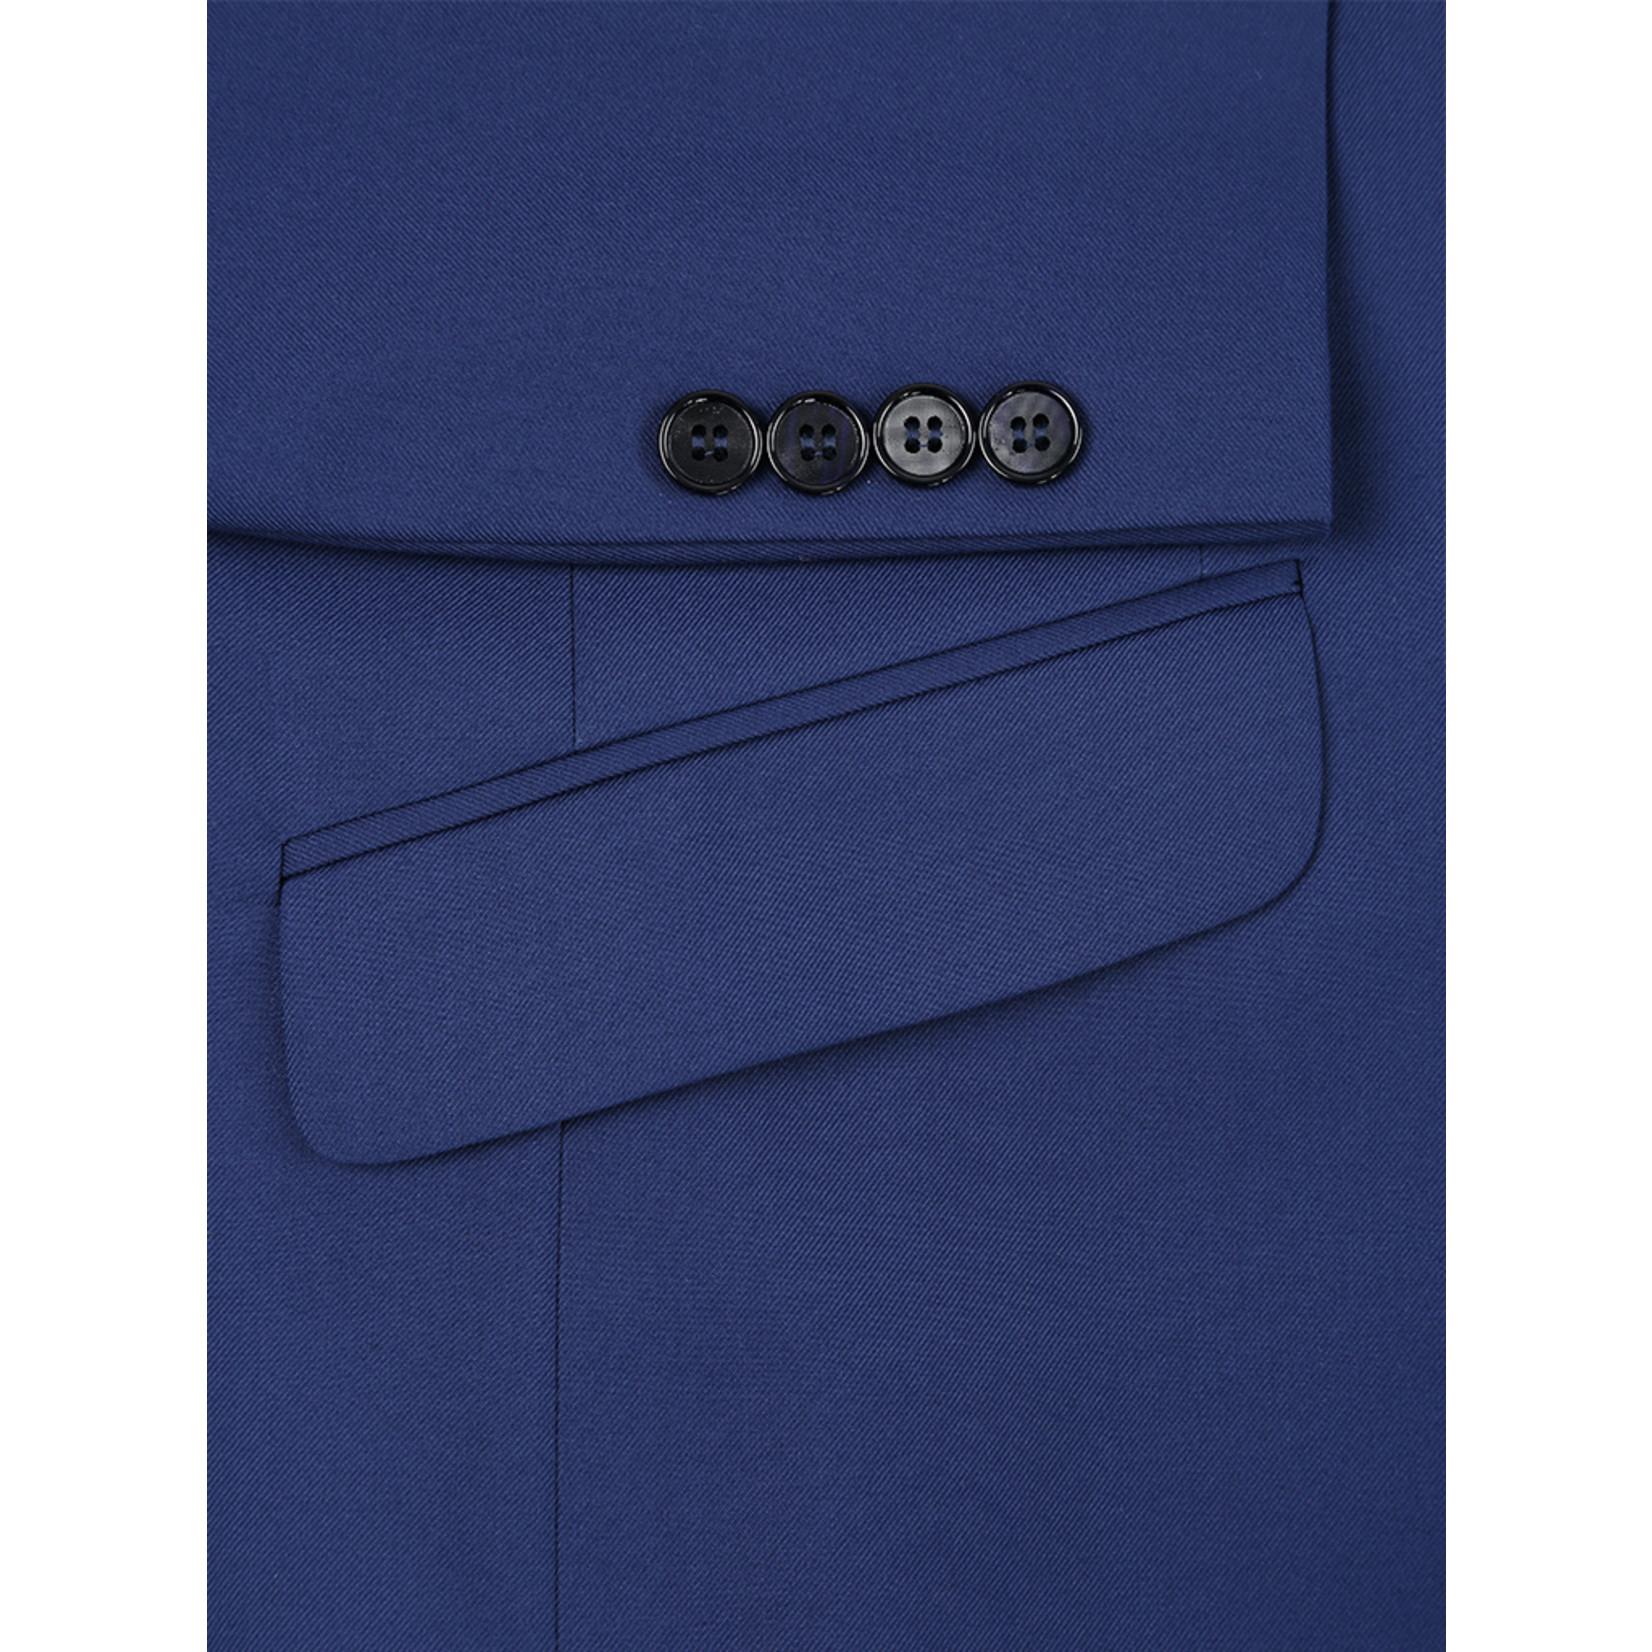 Renoir Renoir Slim Fit Suit 201-20 Electric Blue